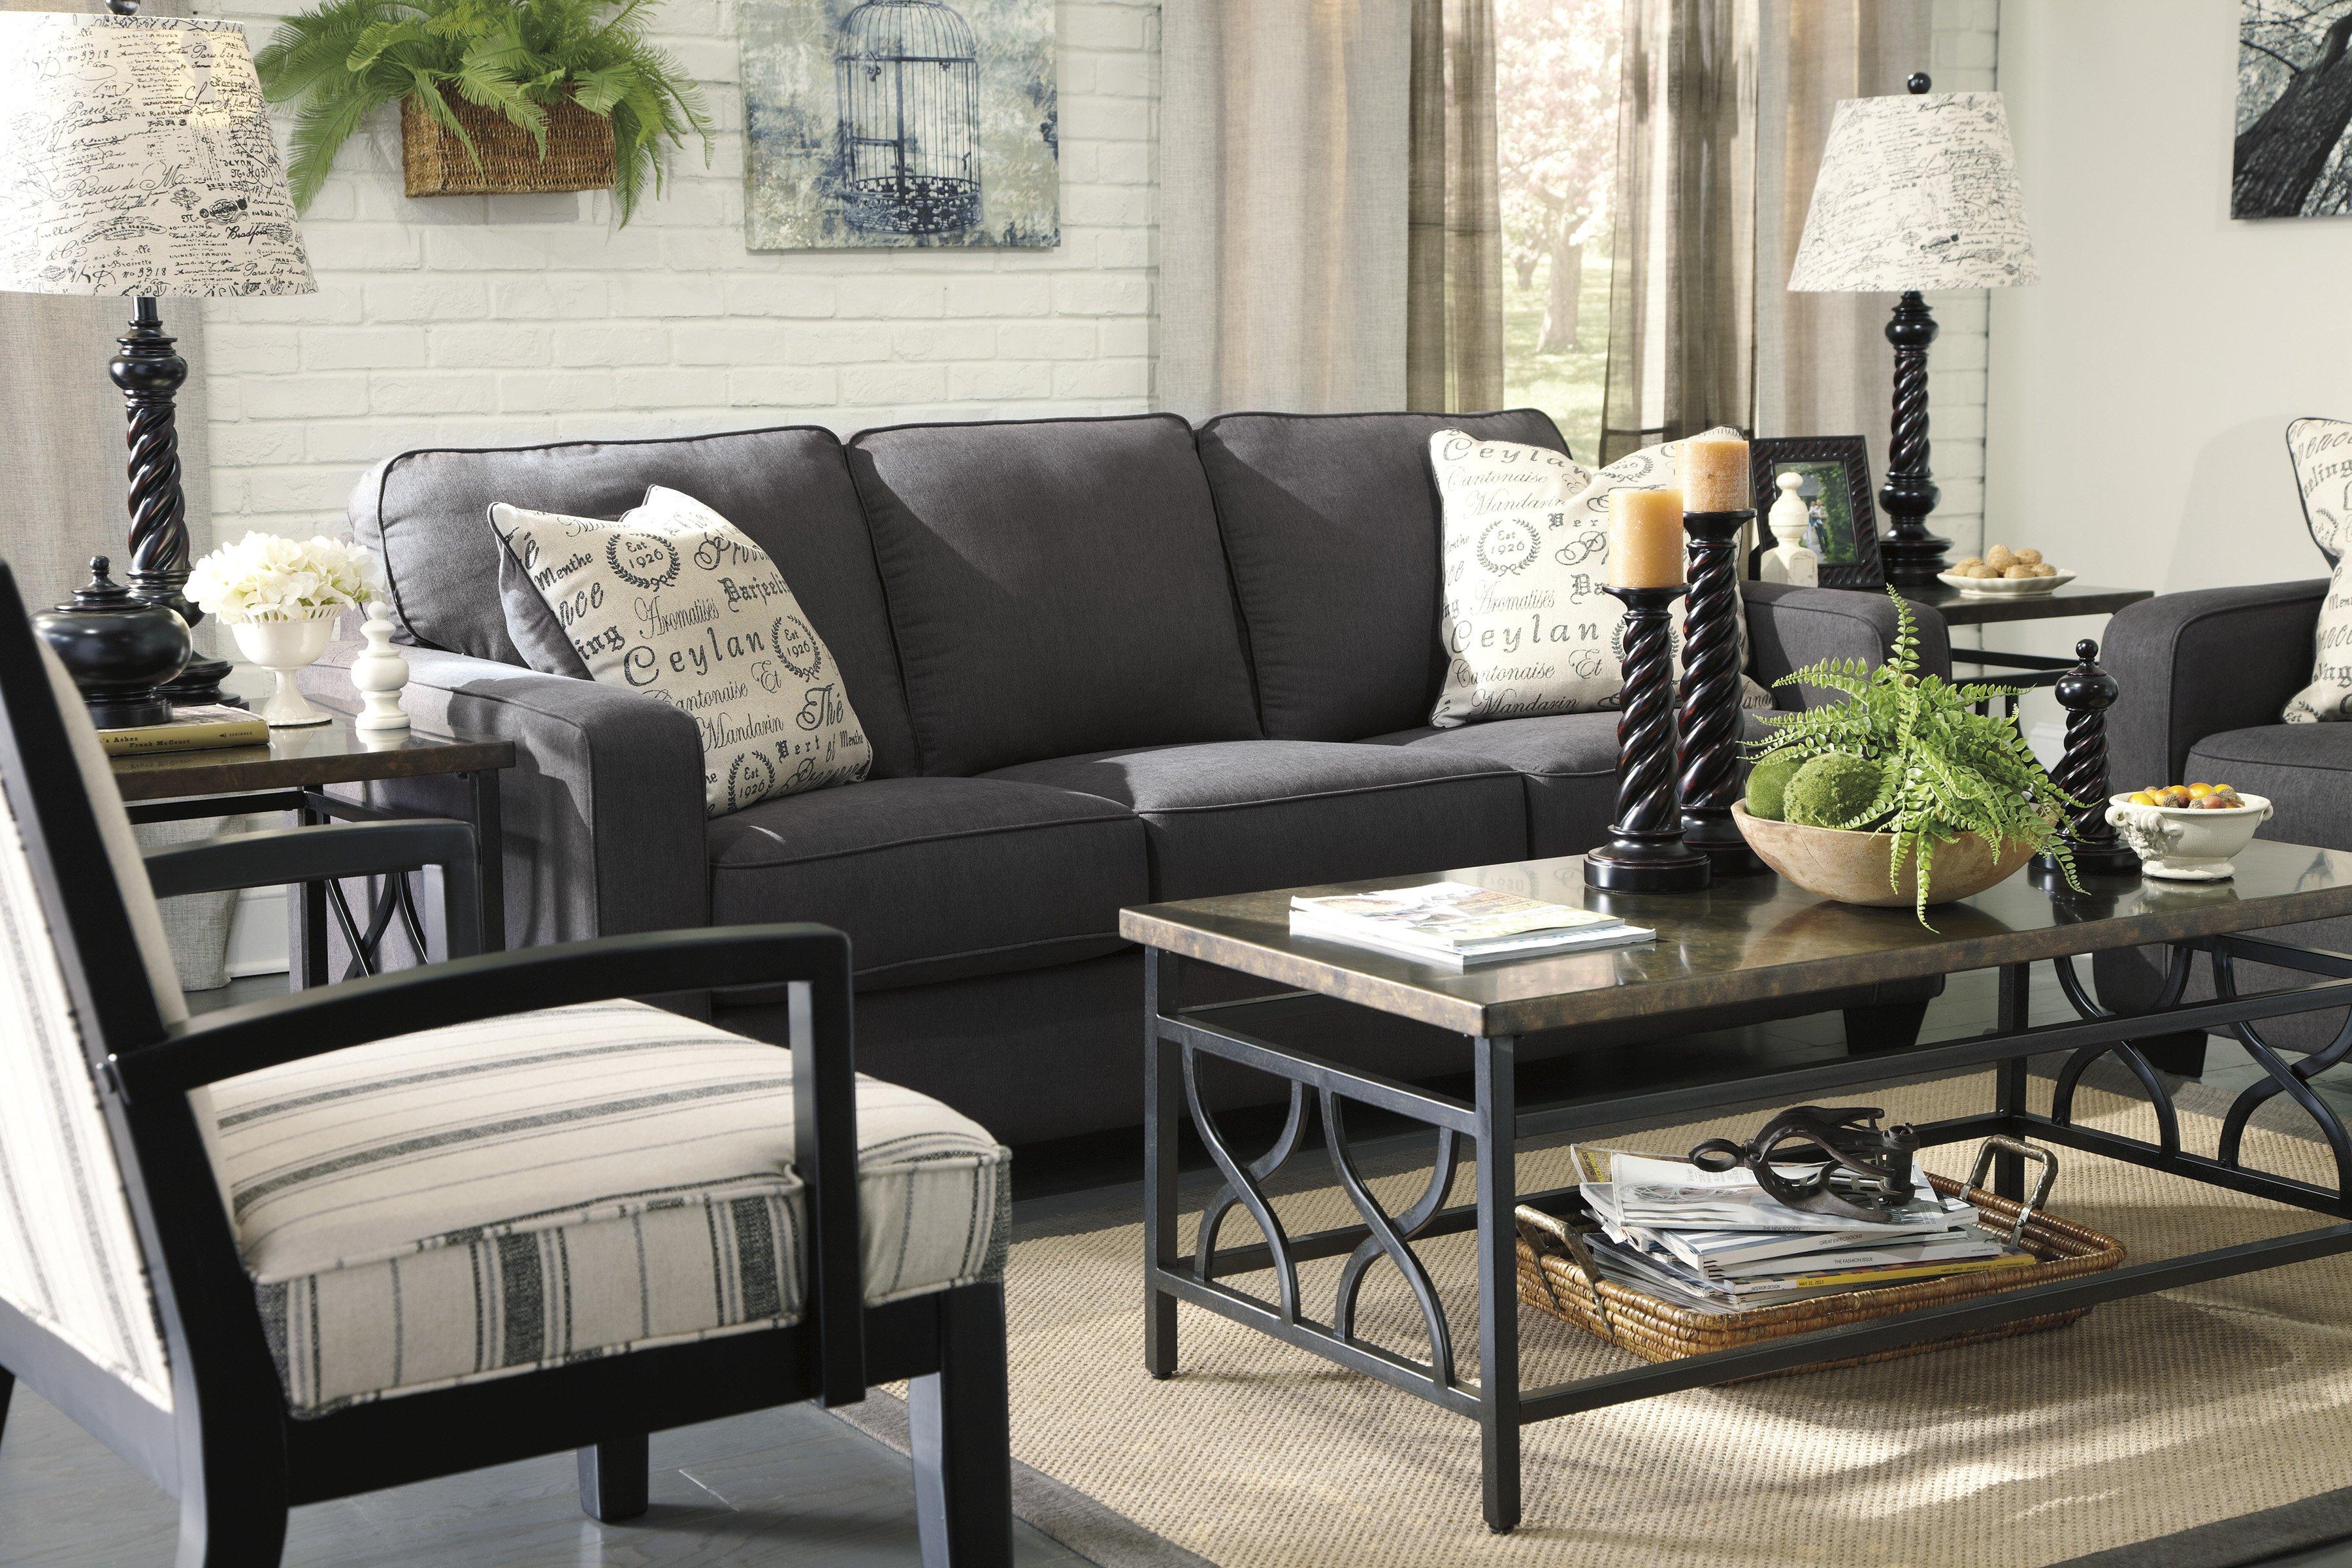 Alenya Sofa New Image Furniture Leasing